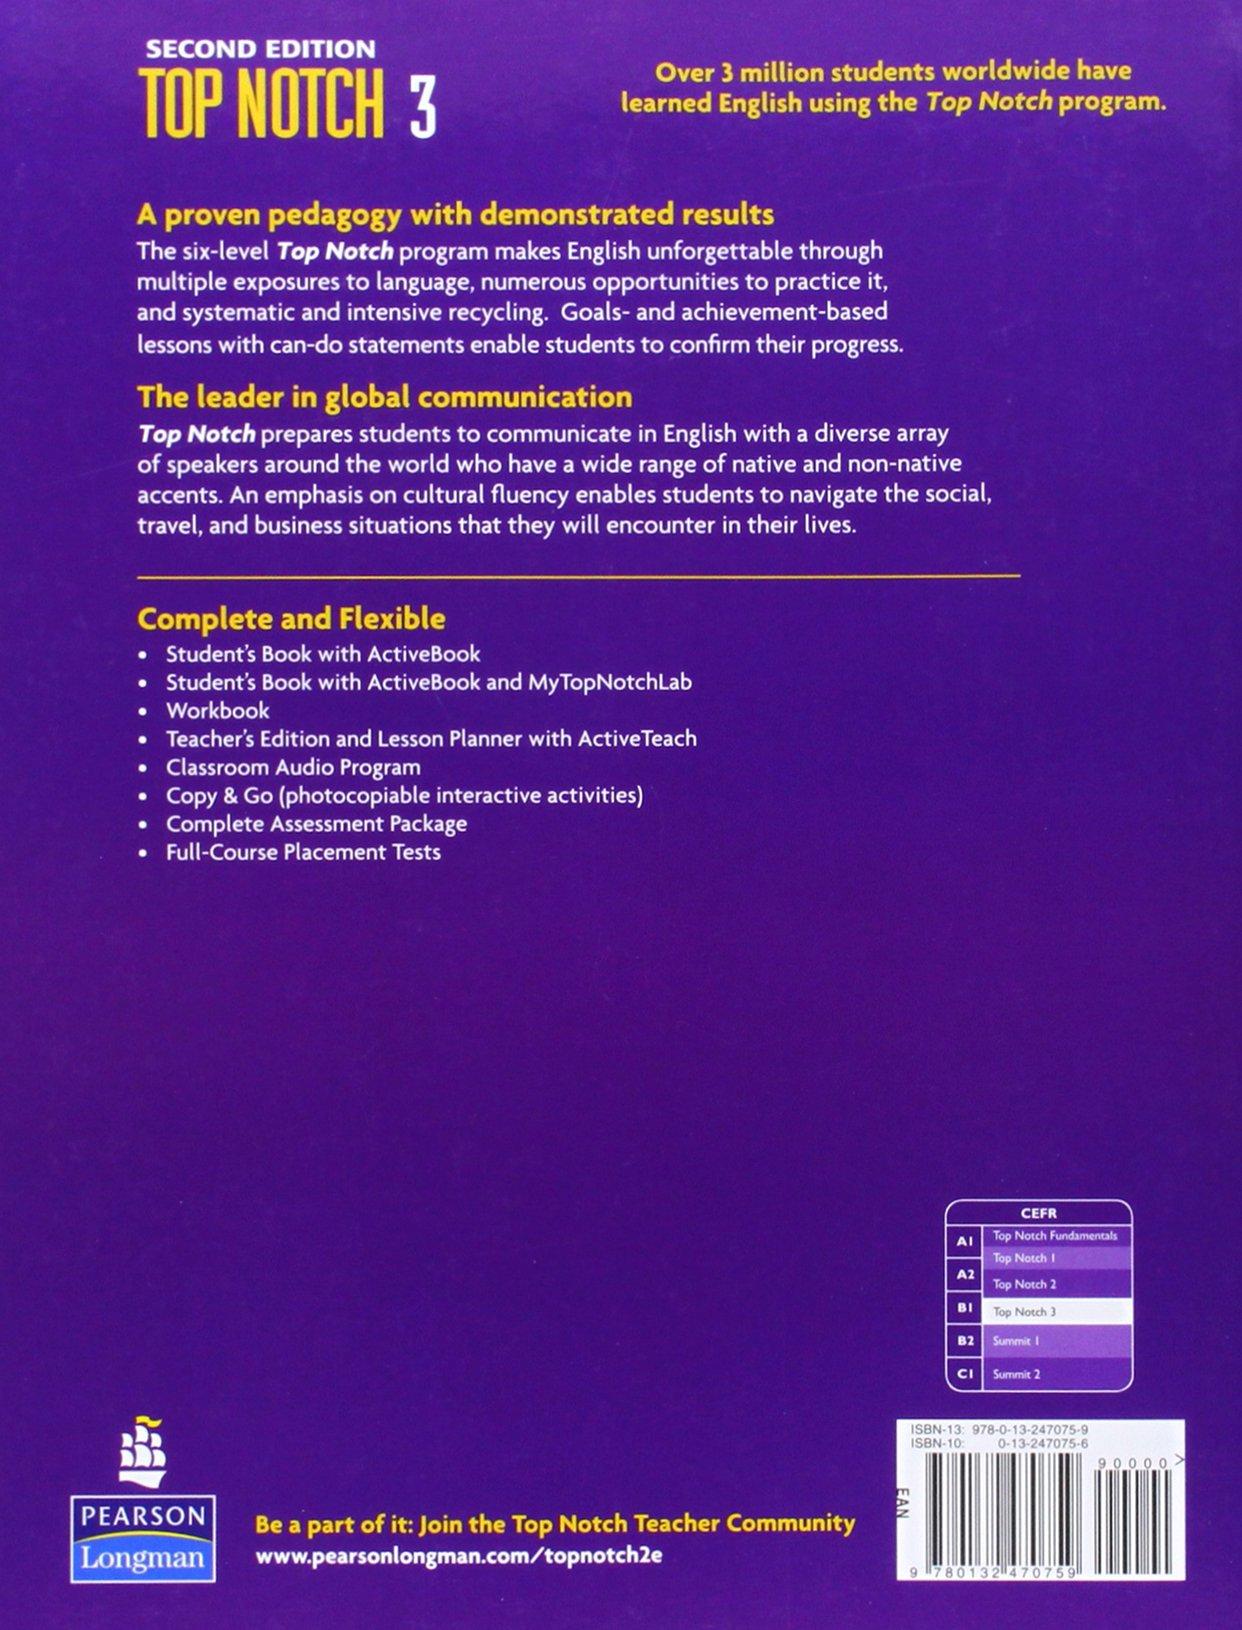 Top Notch 3 Workbook A Cdi Box Wiring Diagram For Titan Generator Array Joan M Saslow Allen Ascher 9780132470759 Rh